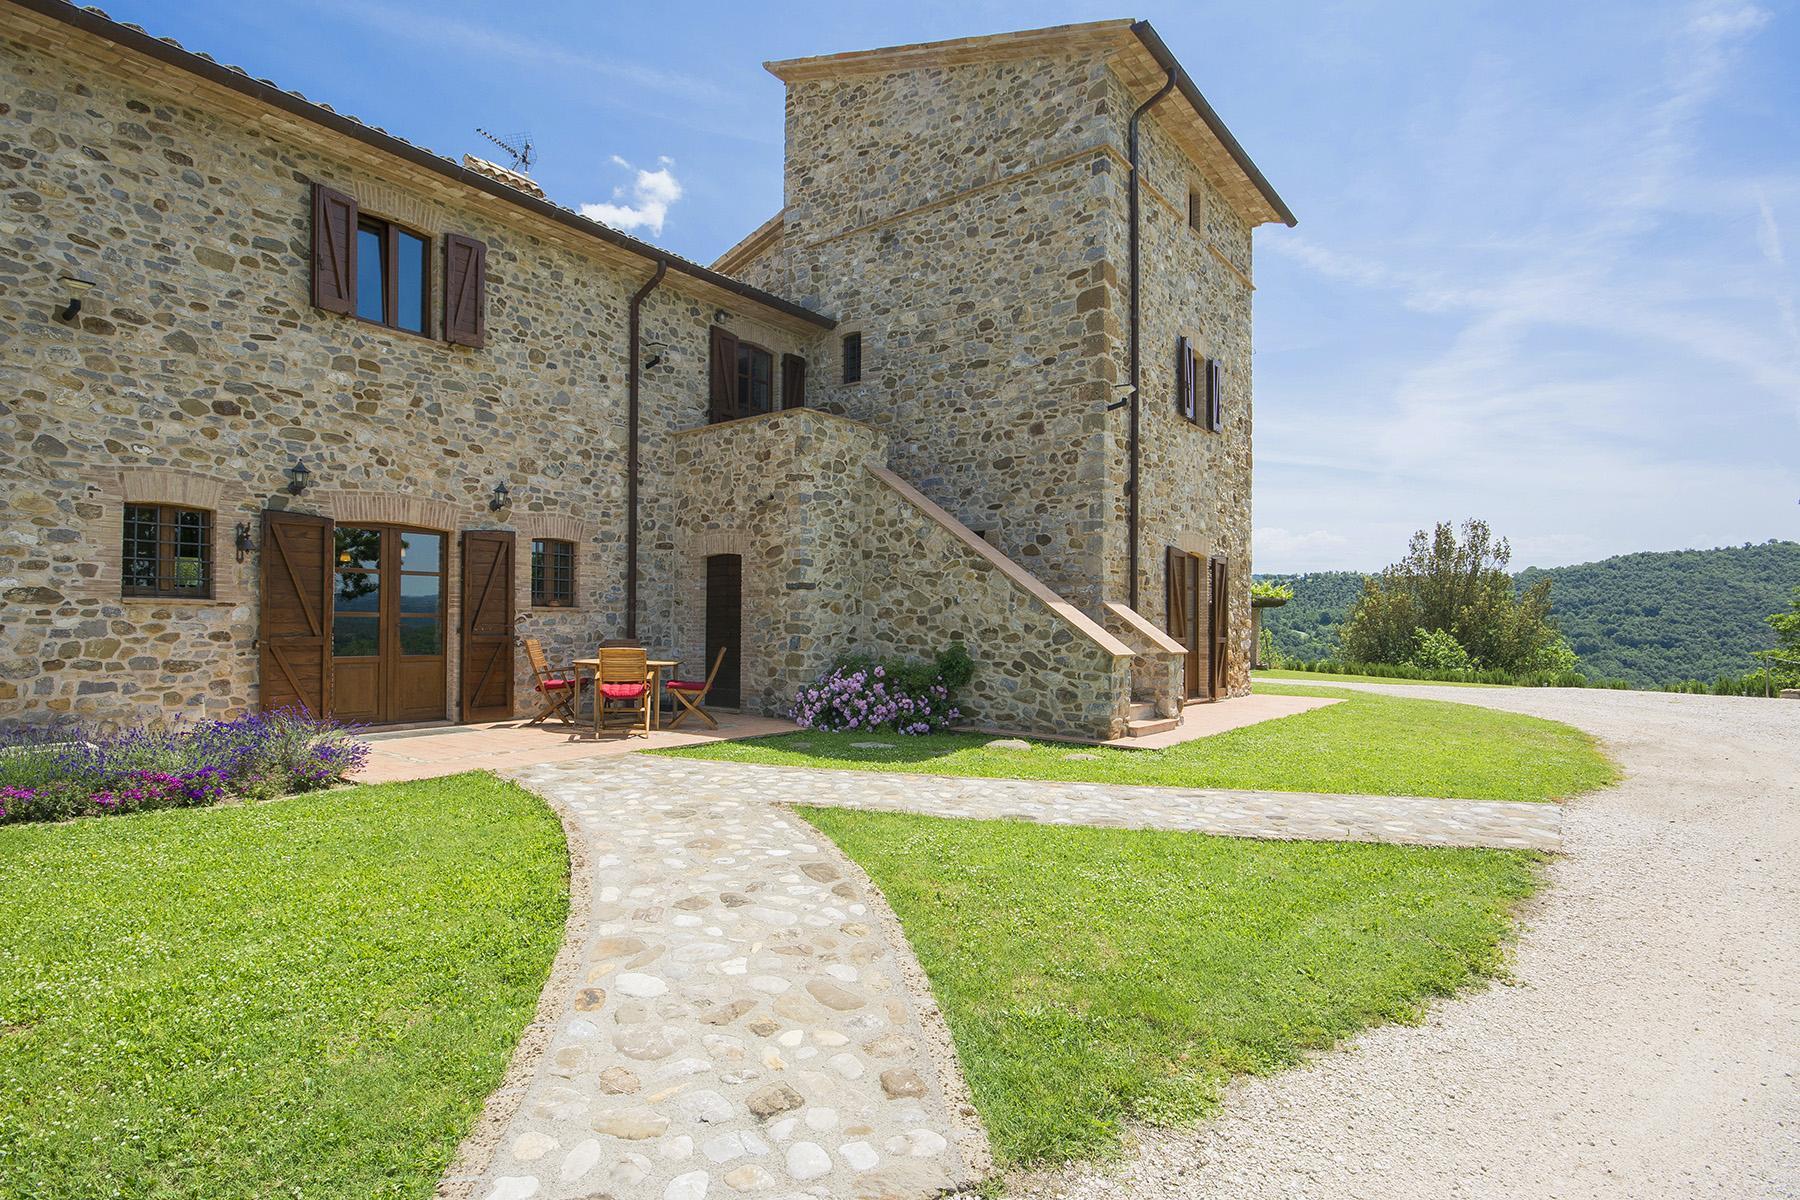 Eccezionale proprietà tra Toscana e Umbria - 1